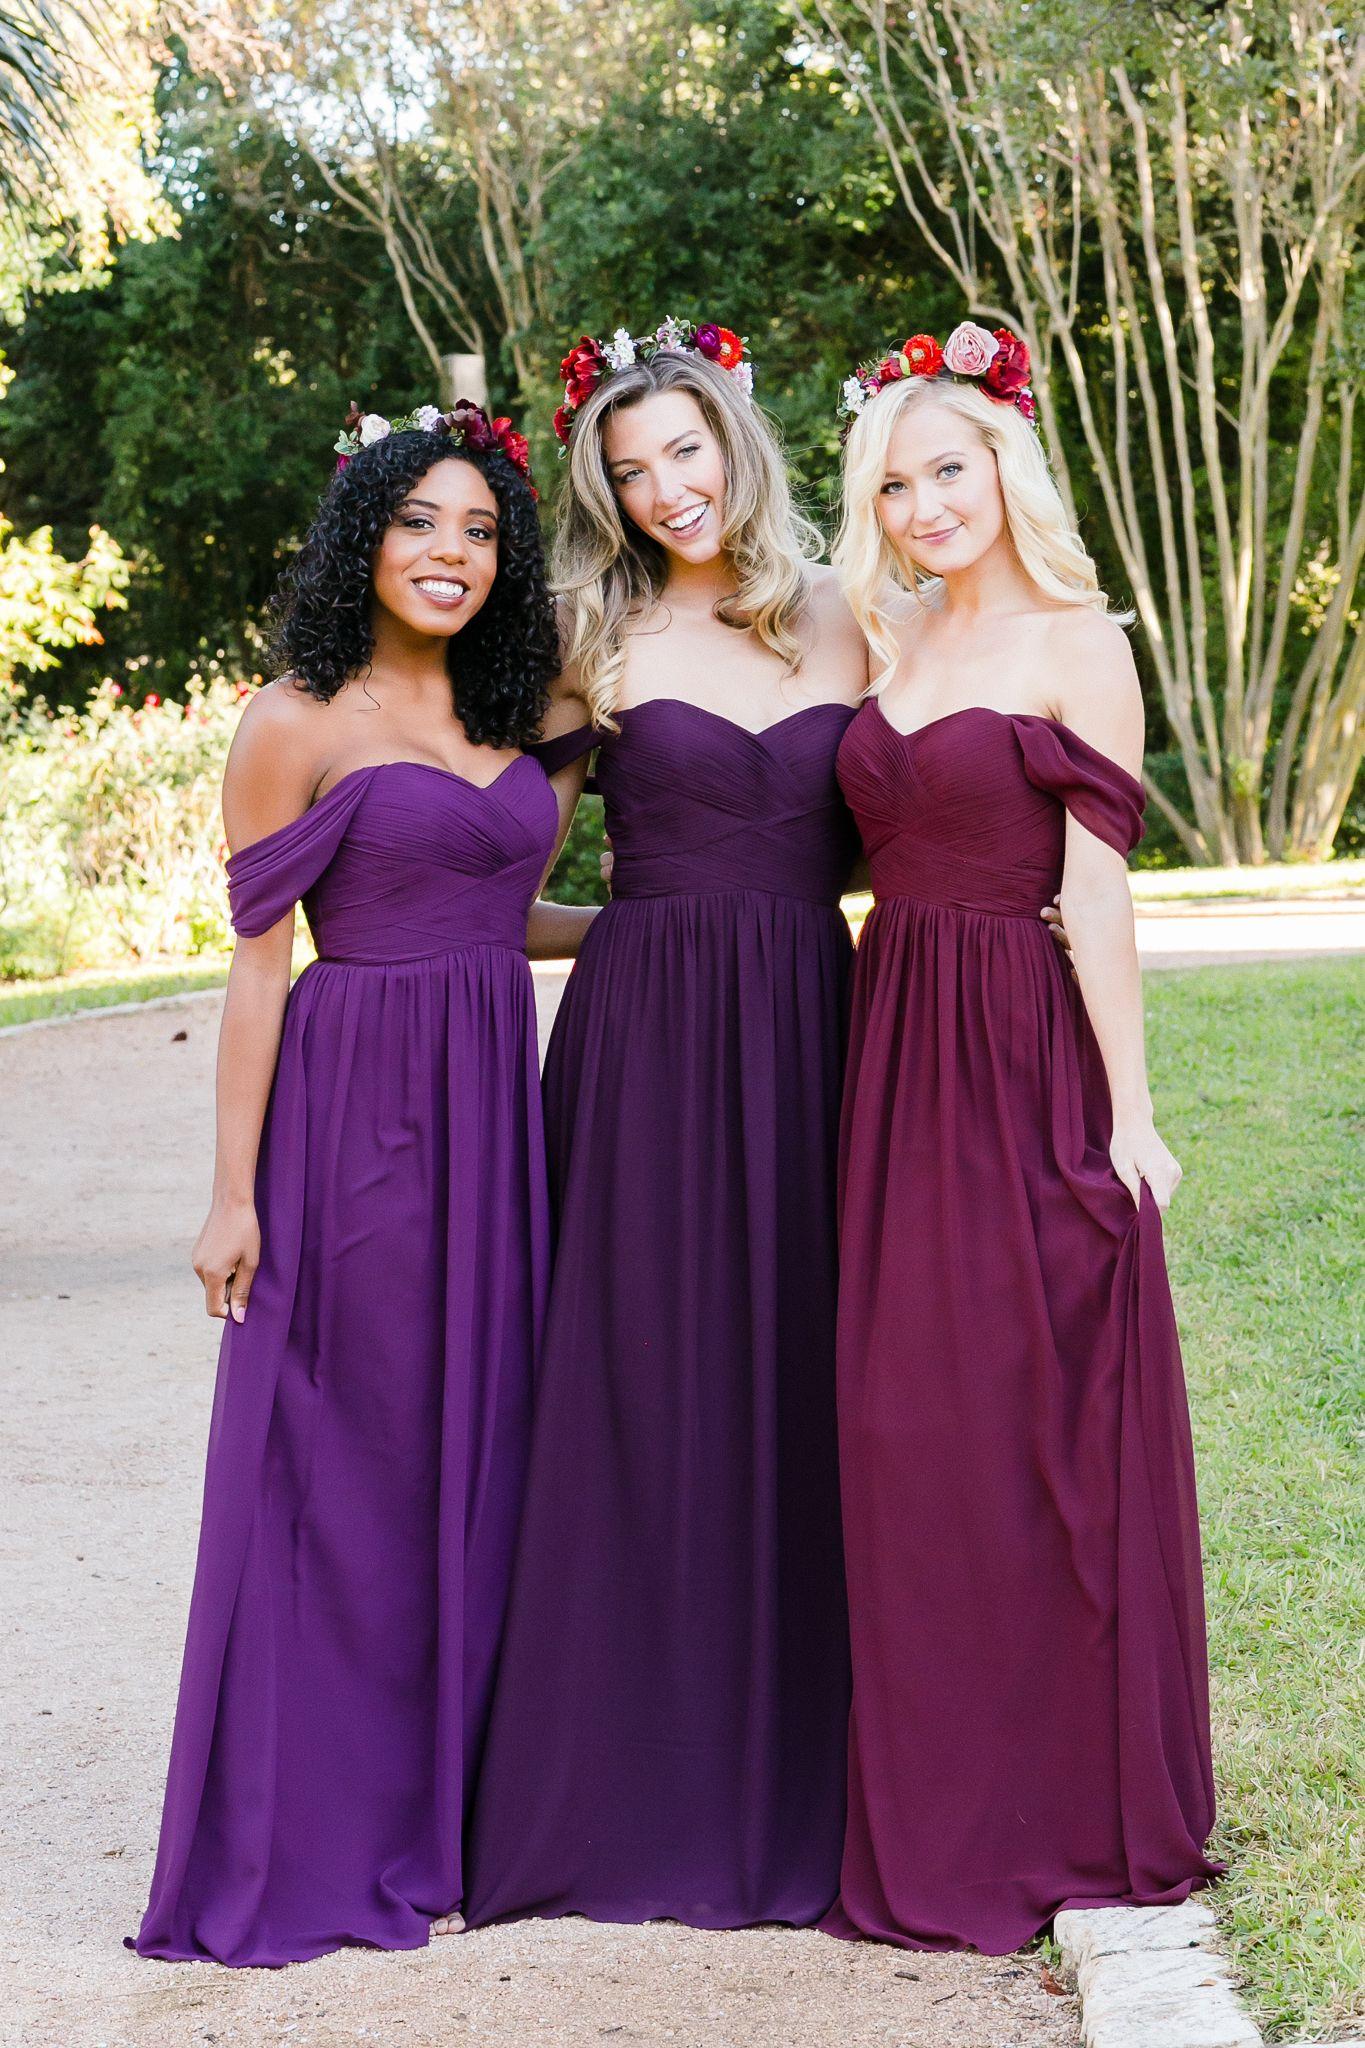 Kennedy Chiffon Convertible Dress | Unique bridesmaid dresses, Maids ...